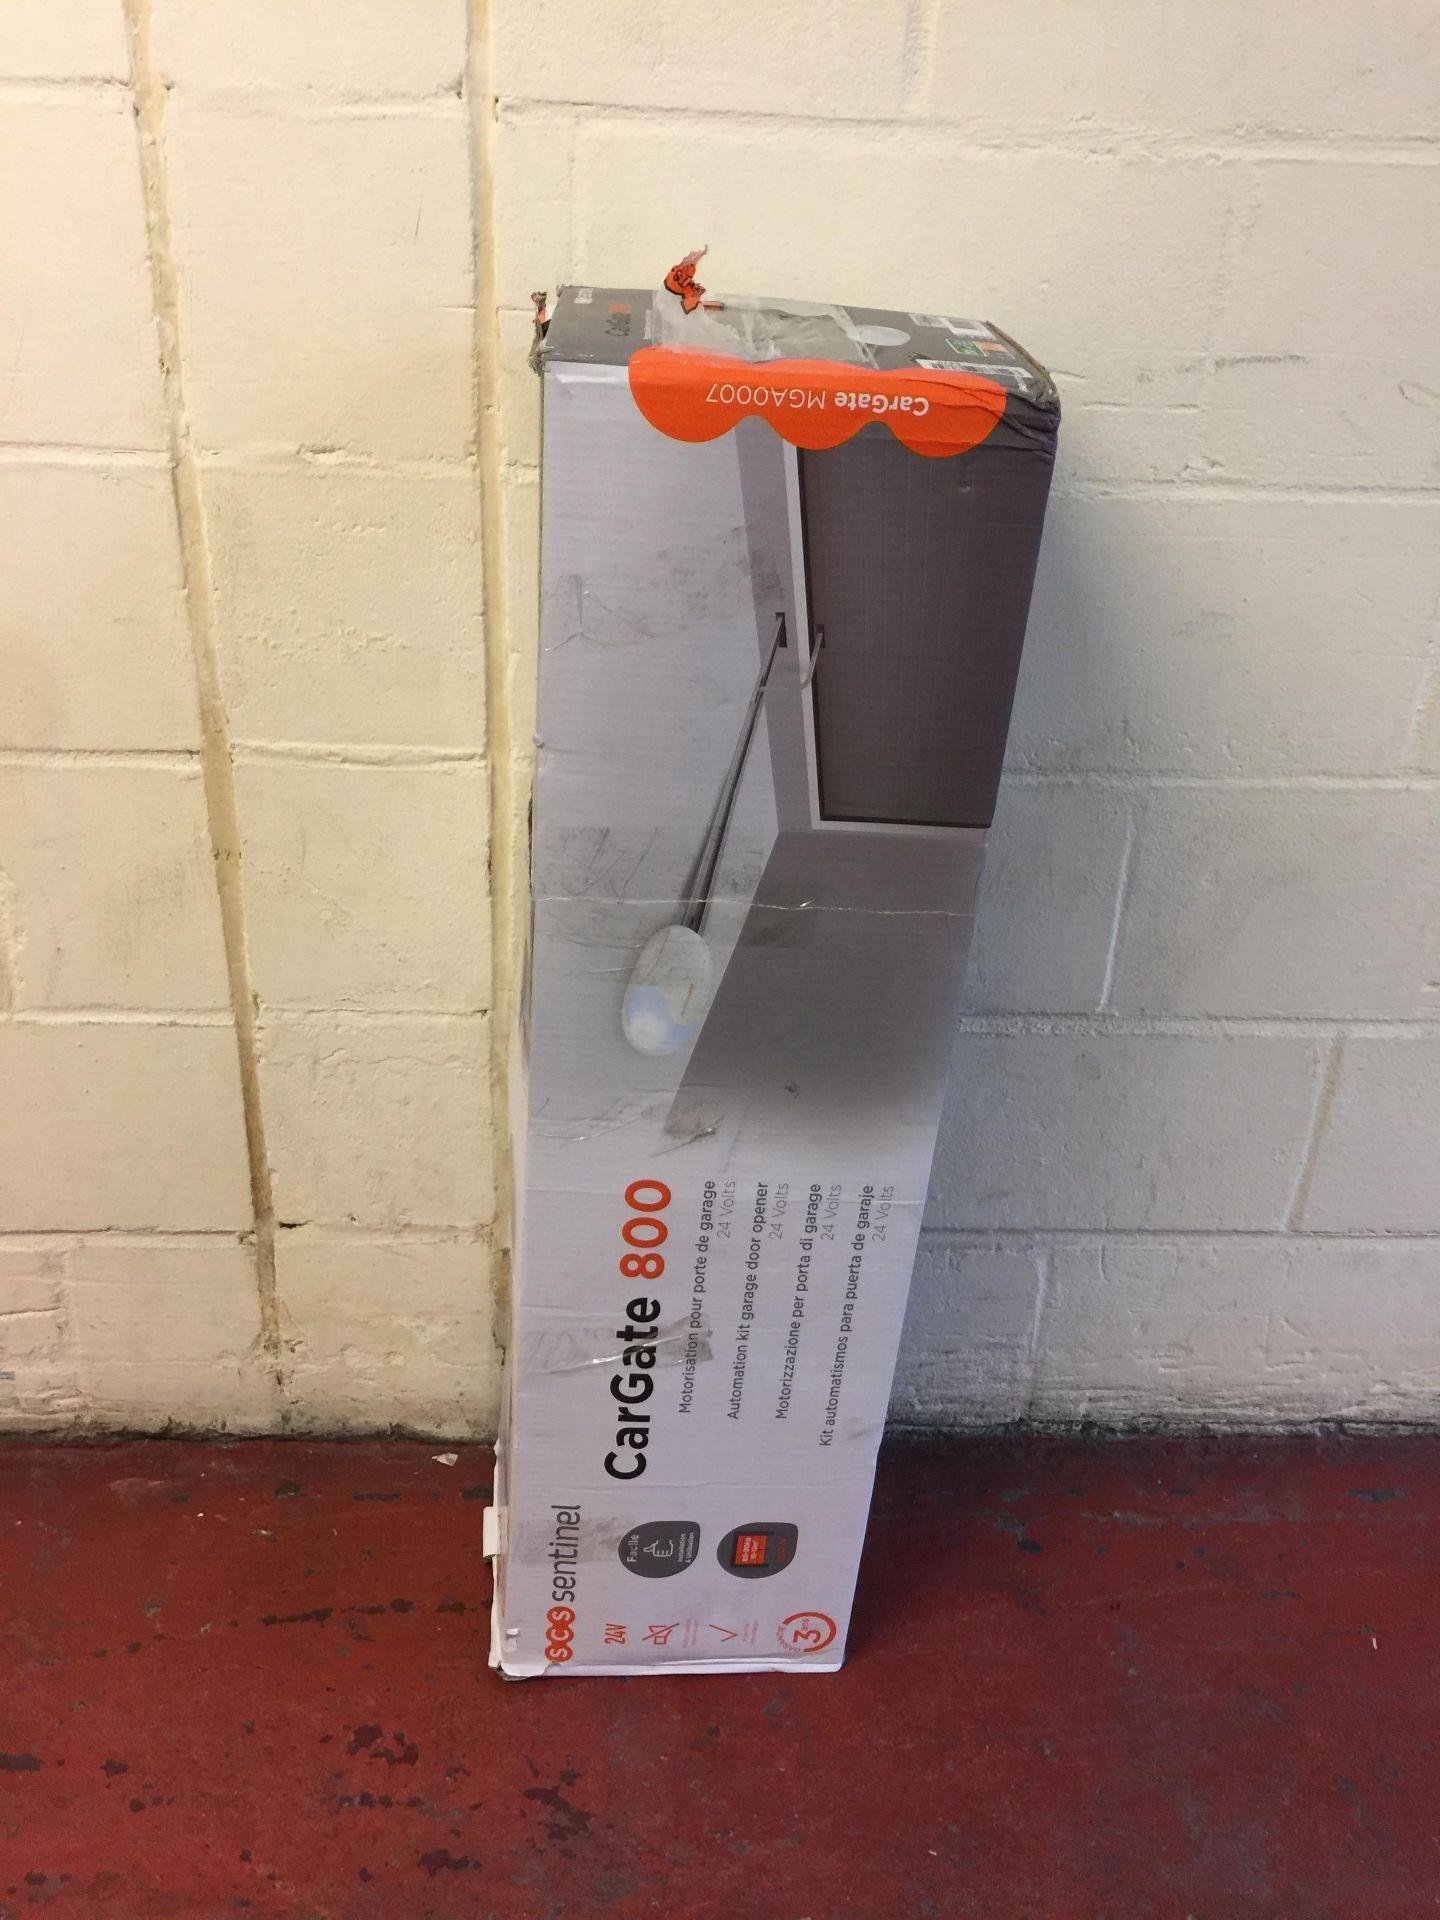 Lot 1 - SCS Sentinel CarGate 800 Automation Kit Garage Door Opener RRP £139.99